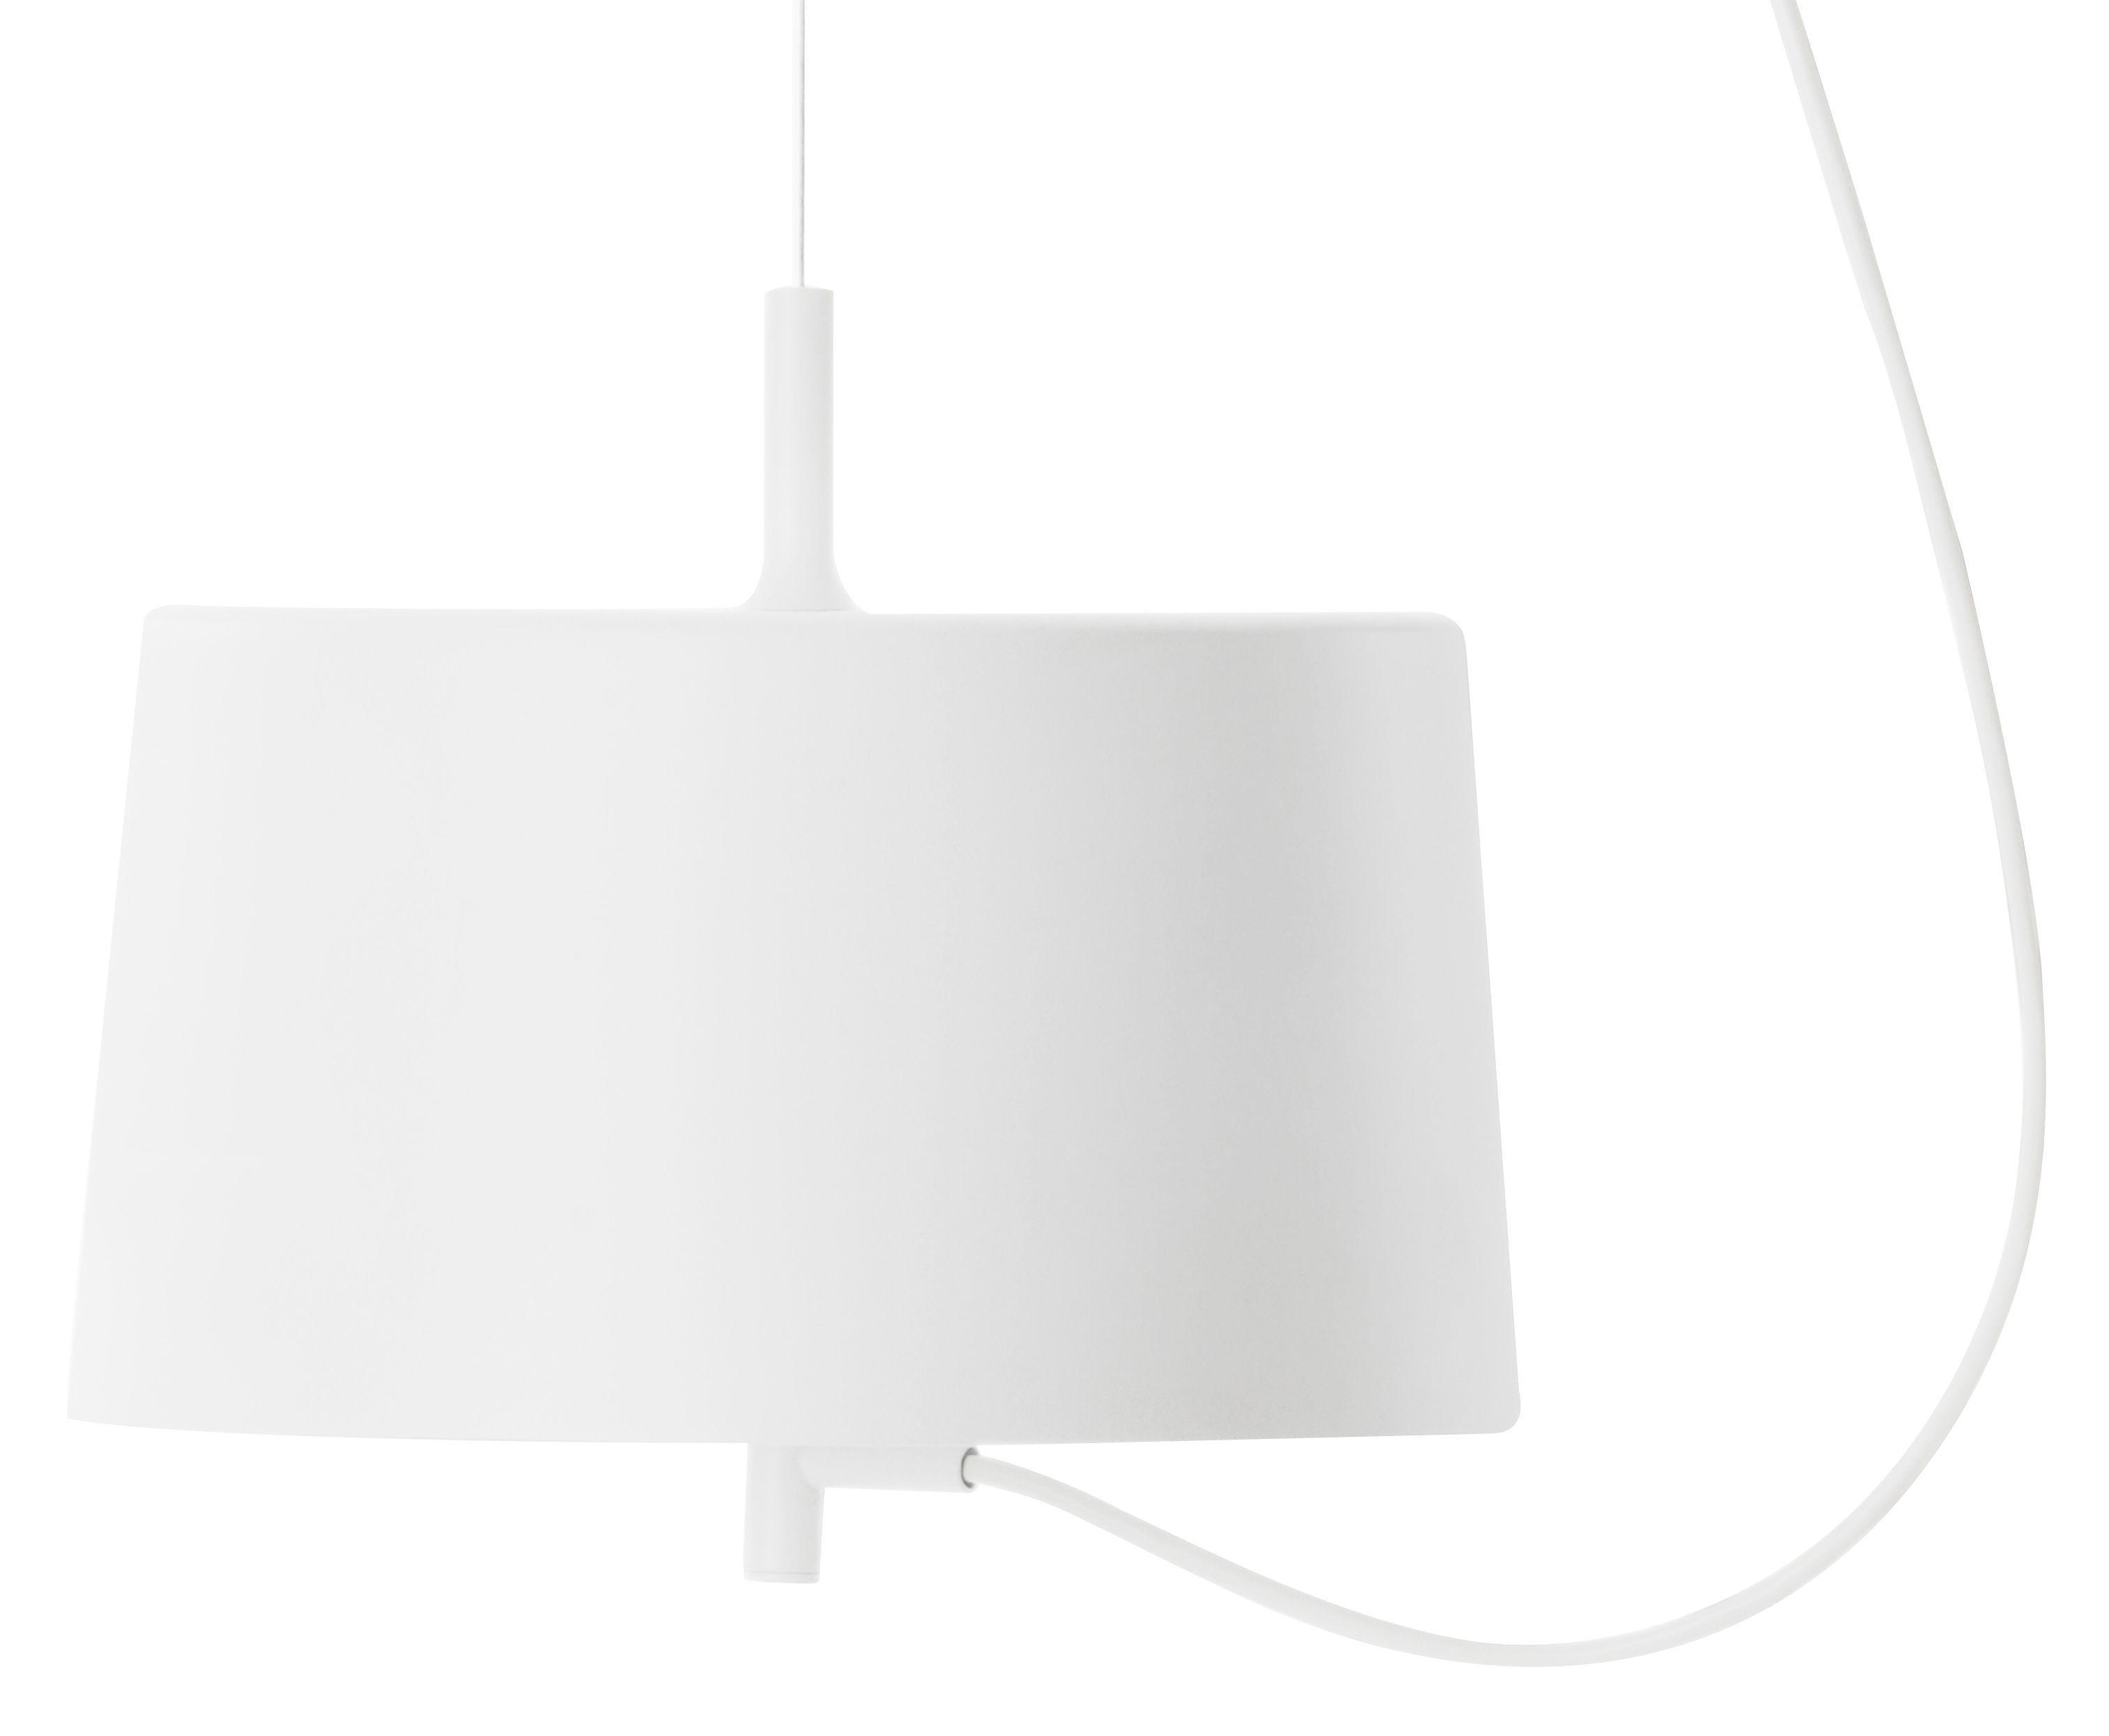 Luminaire - Suspensions - Suspension Nendo Cylinder w132s / Ø 28,5 cm - Wästberg - Blanc - Acier